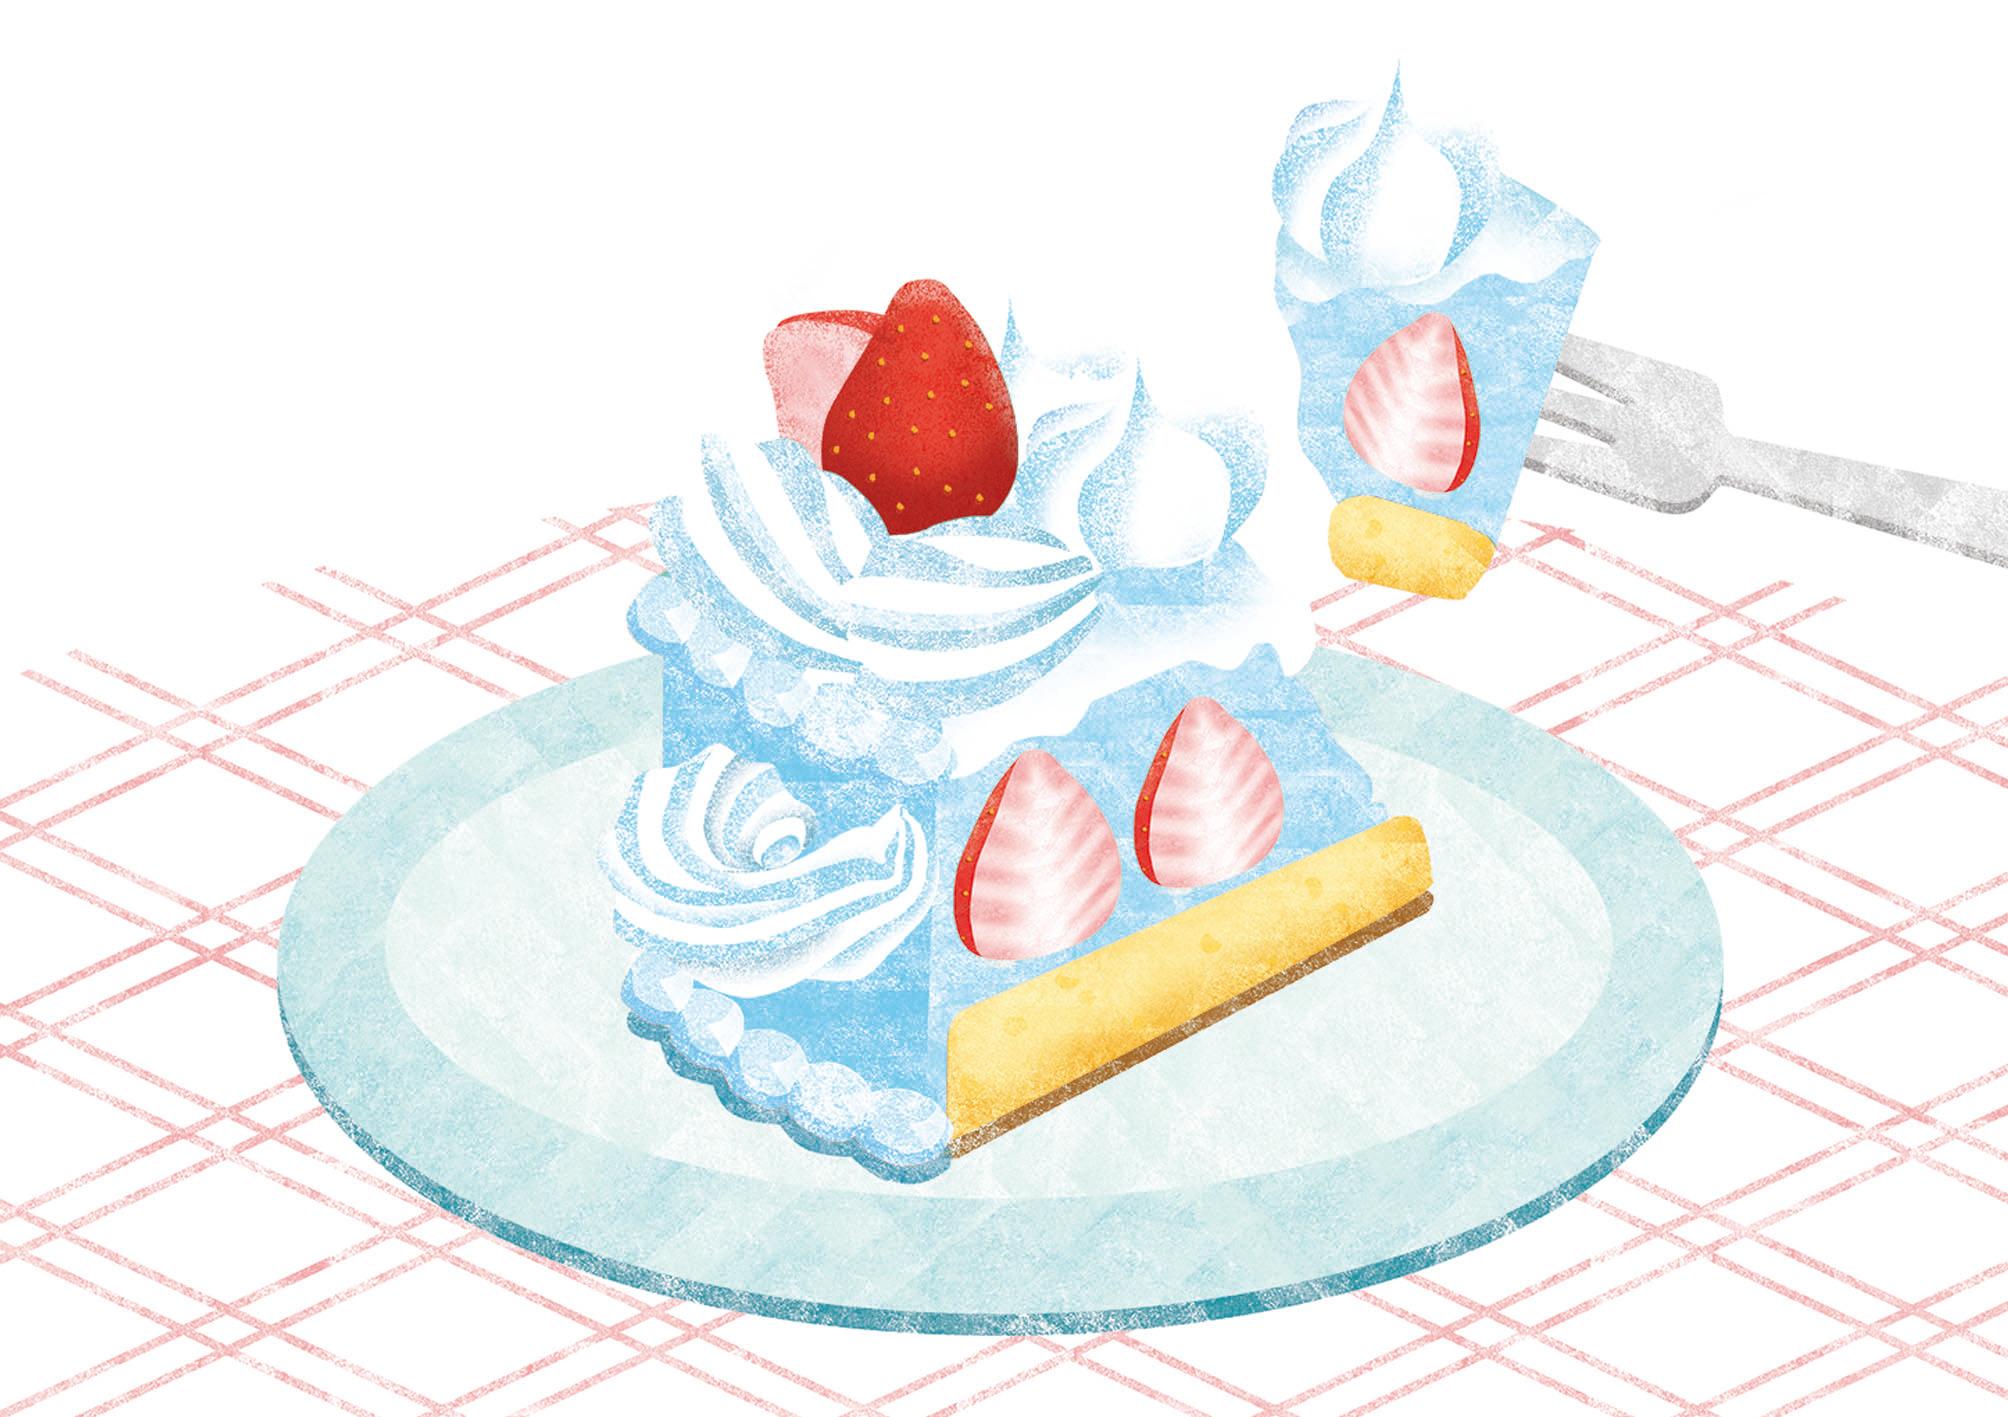 eat shortcake